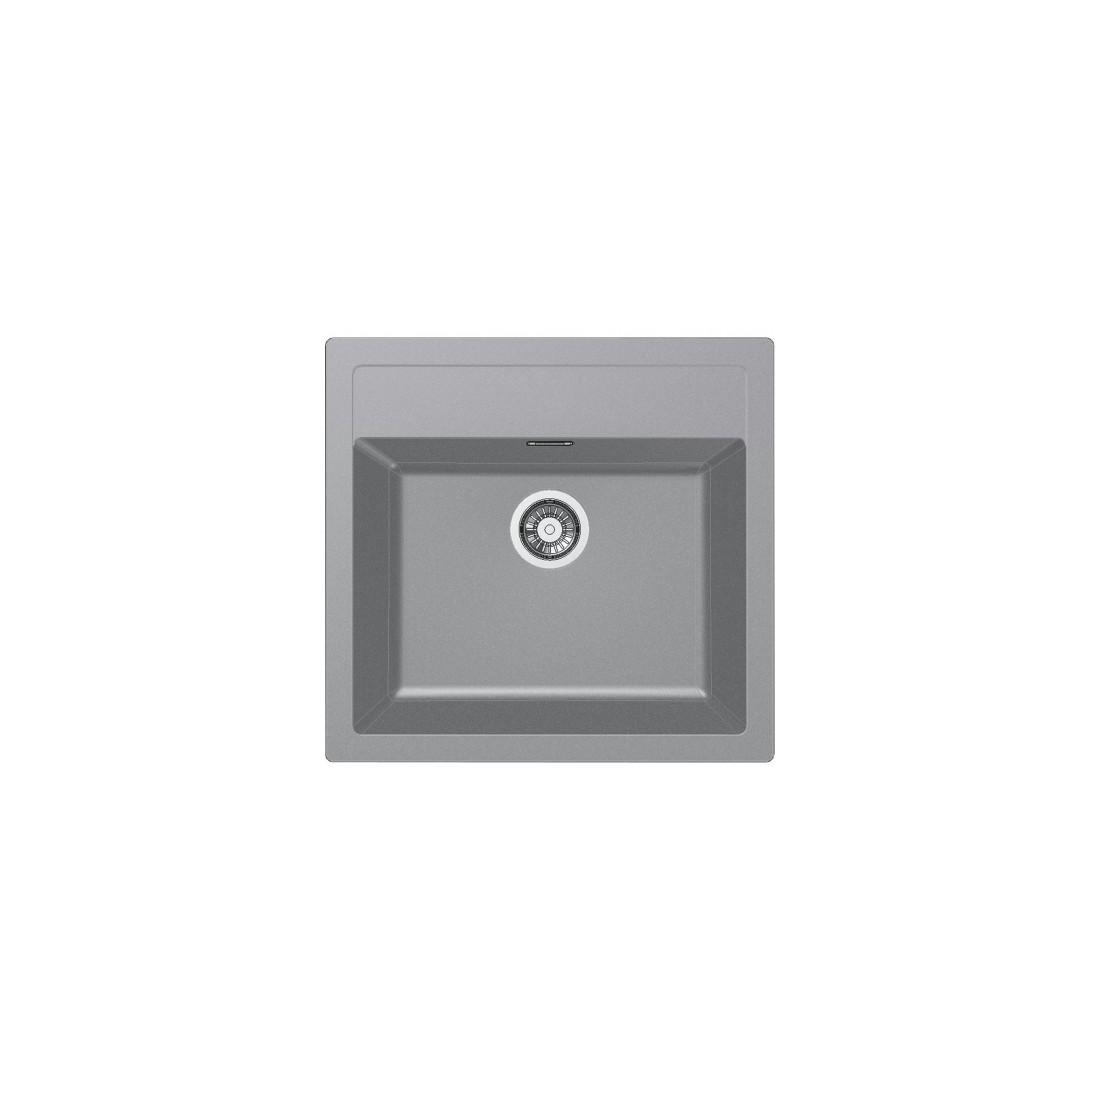 Tectonite plautuvė Franke, Sirius SID 610, Urban grey